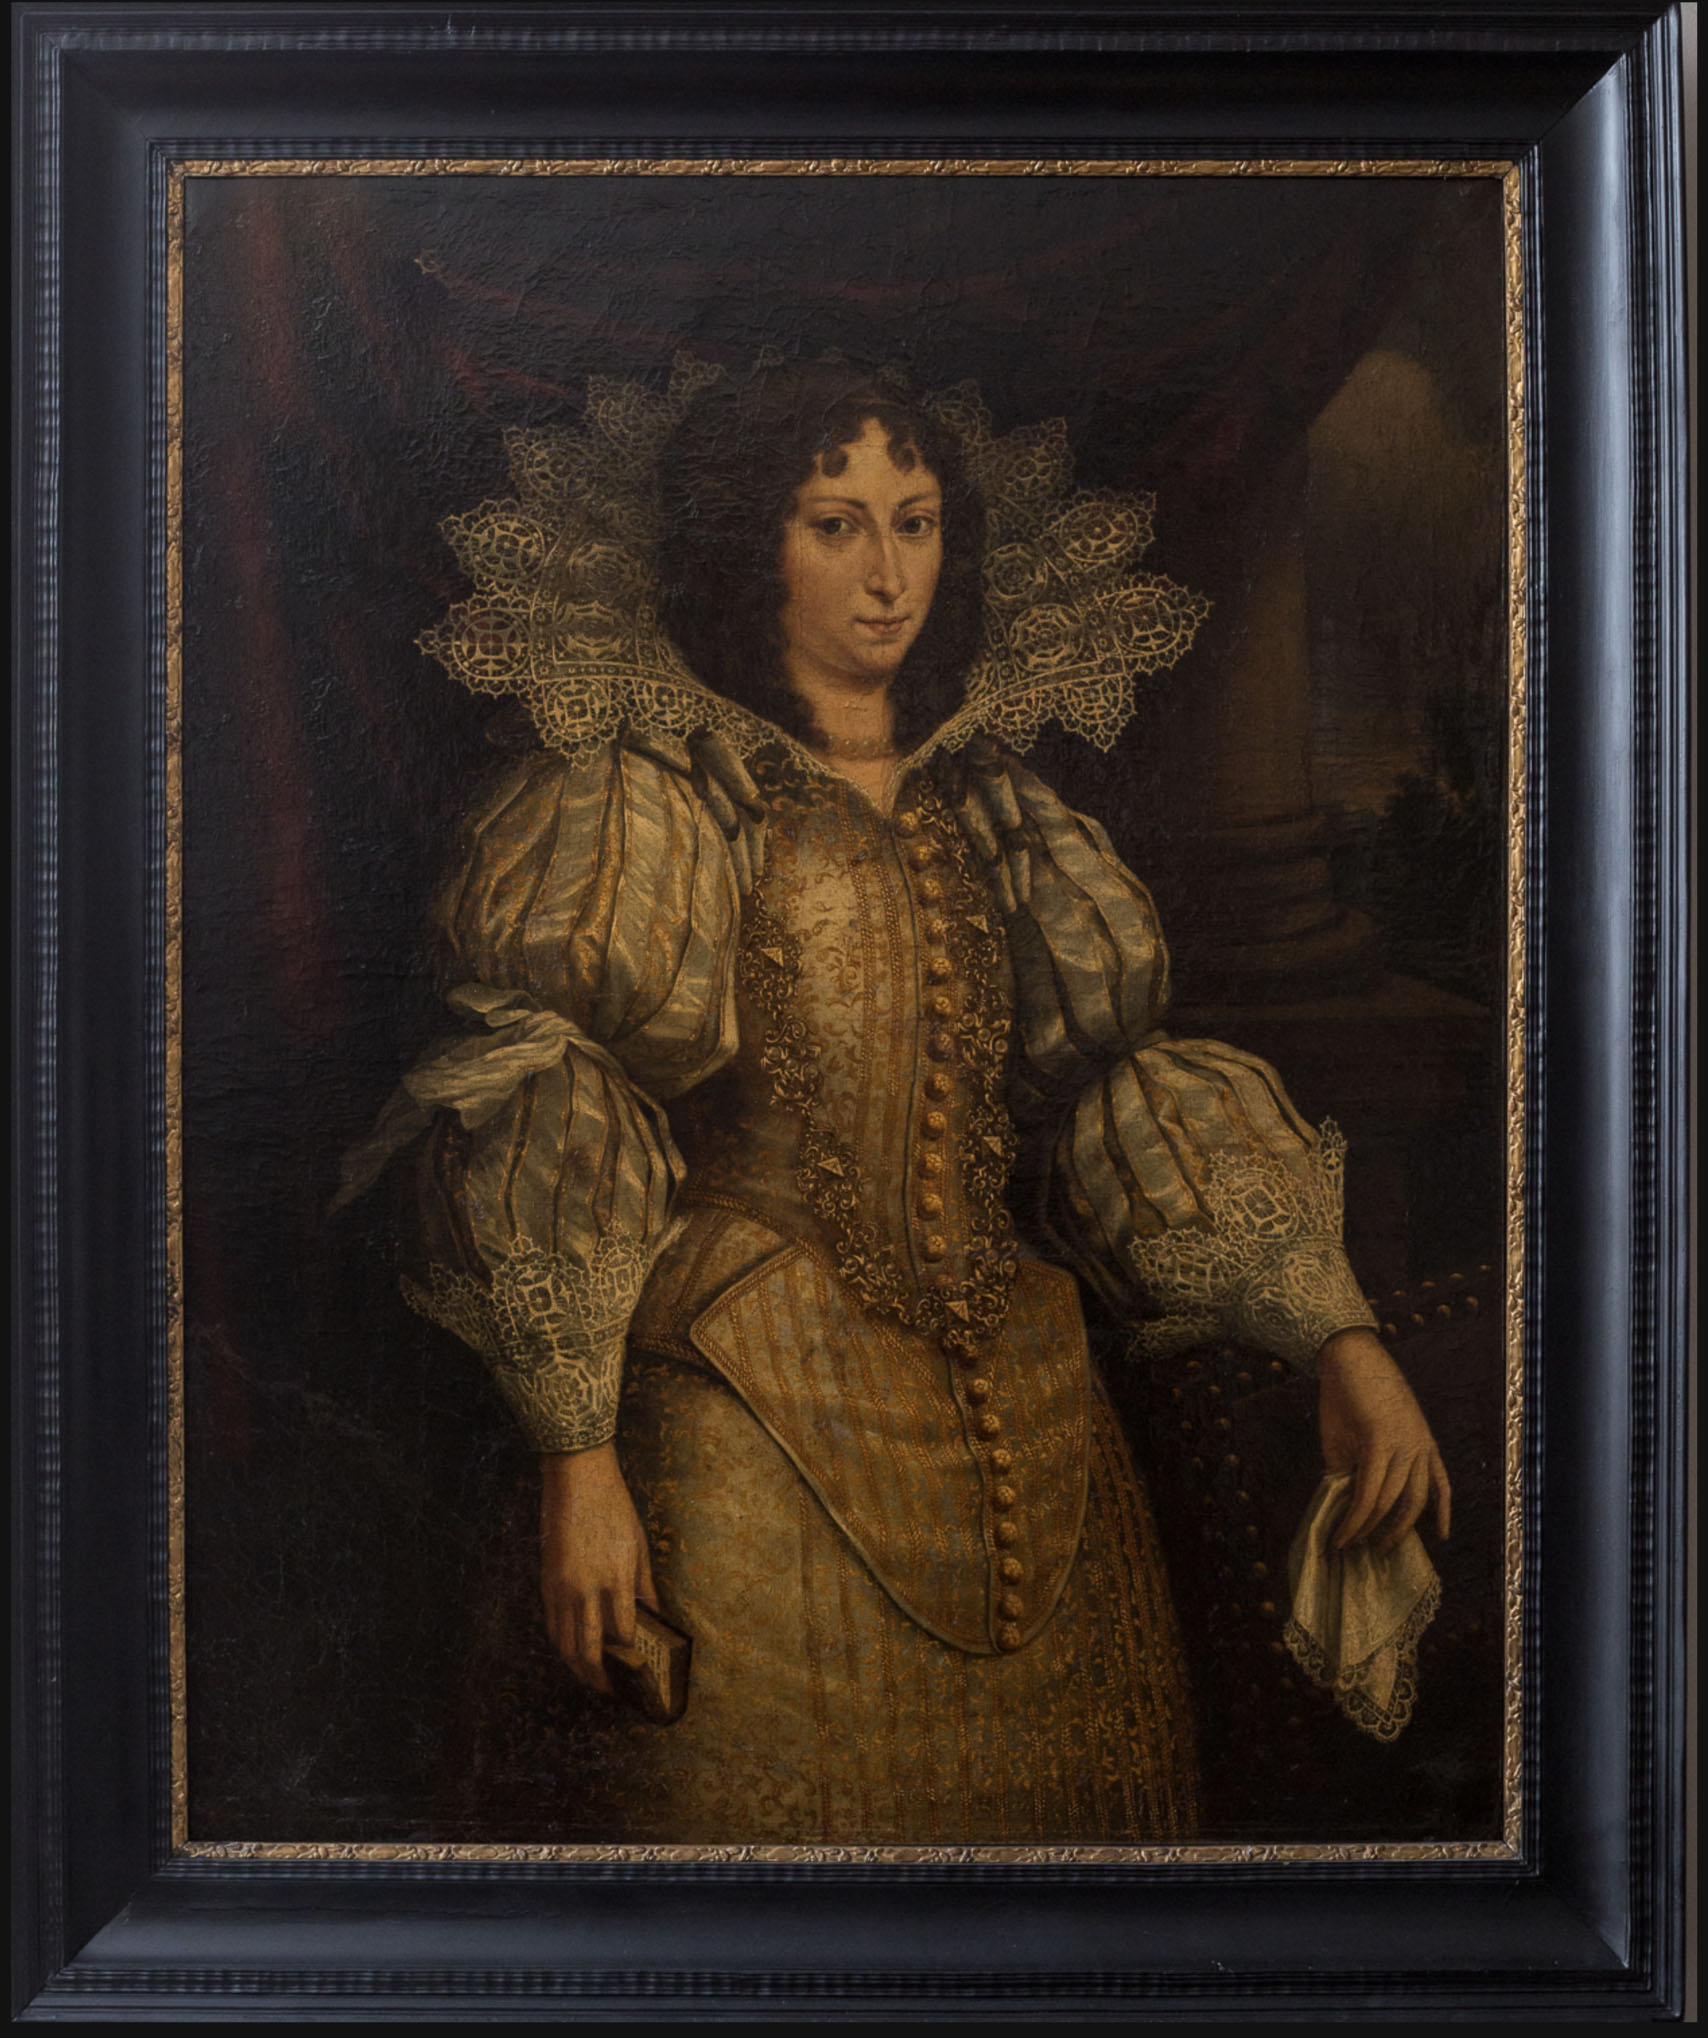 Sfumato Portrait of a Noblewoman in the Renaissance Style